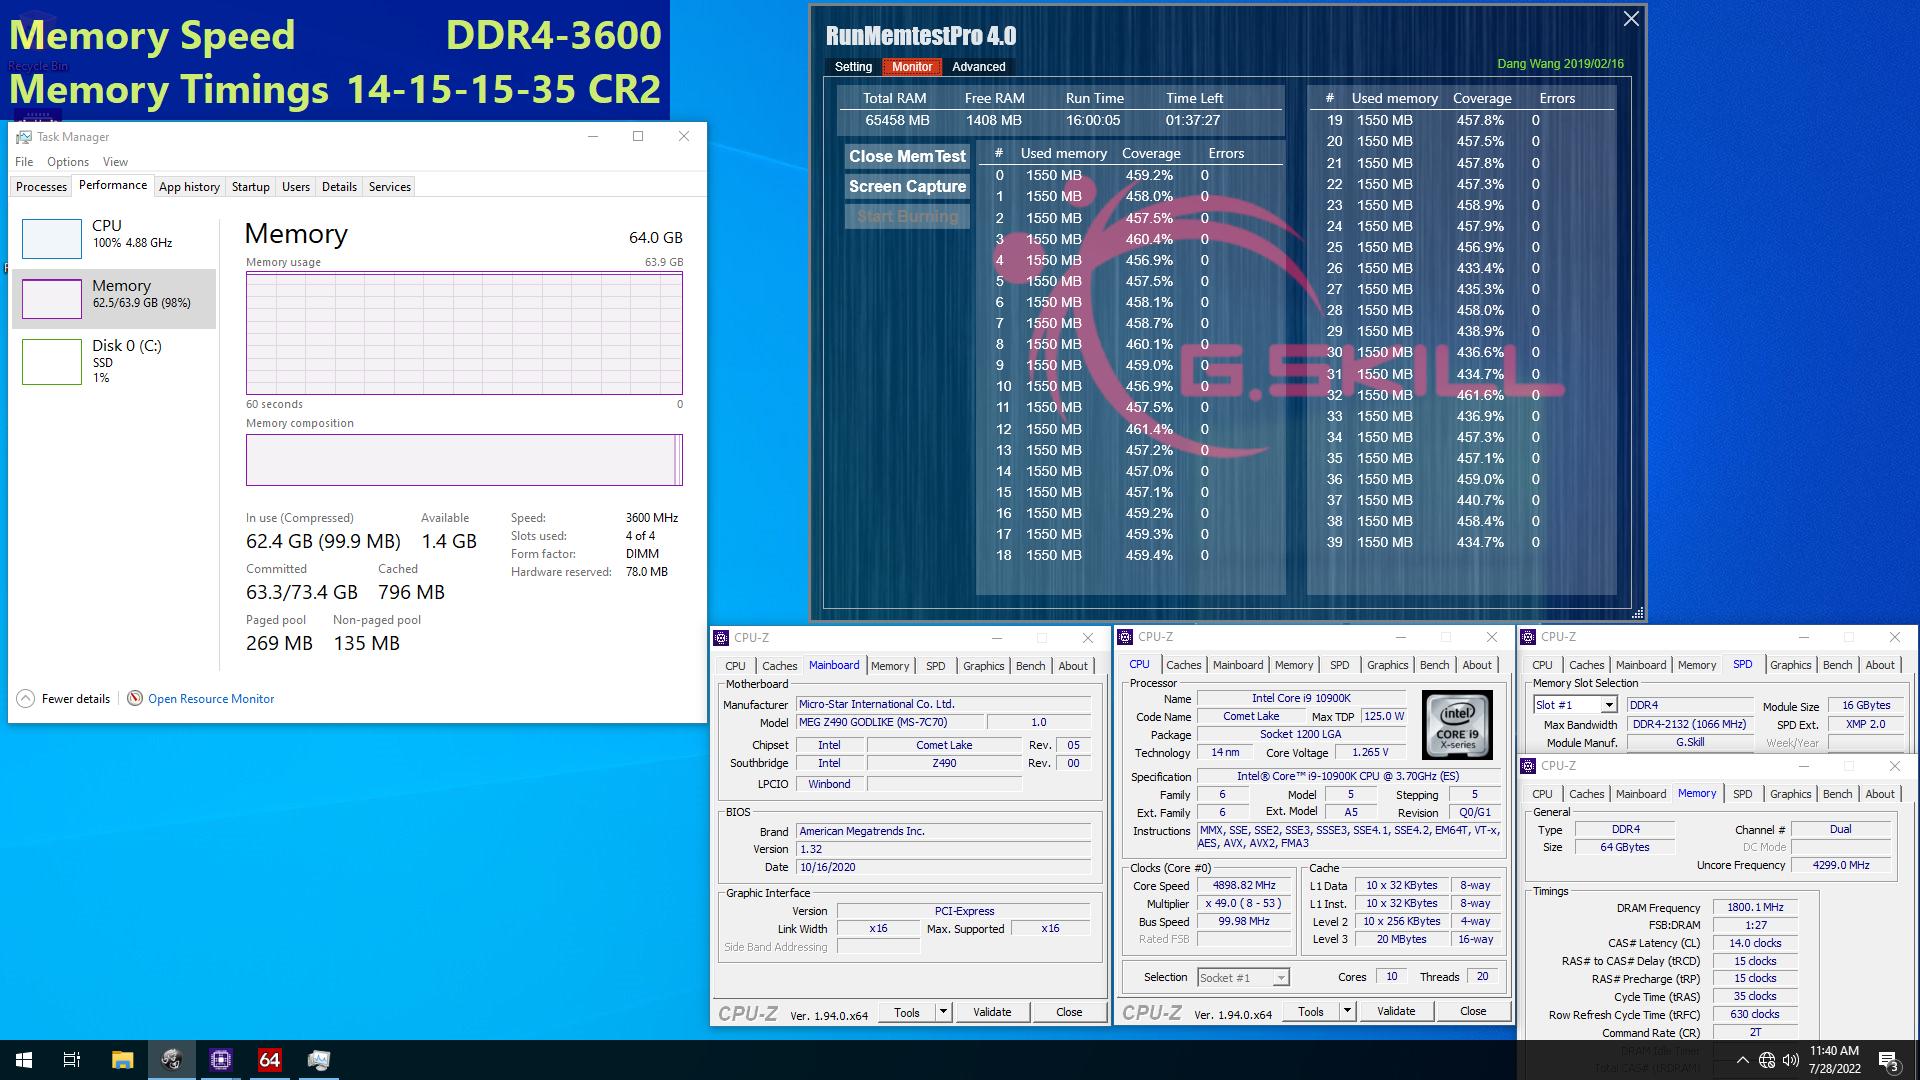 03 3600c16 16gbx4 msi G.SKILL ประกาศเปิดตัวแรมประสิทธิภาพสูงด้วยชิป Samsung B die ที่เน้น Latency ที่ต่ำในรุ่น Trident Z Neo, Trident Z Royal, Trident Z RGB, และ Ripjaws V ในบัสแรม DDR4 3600 CL14 64GB (16GBx4) และ 32GB (16GBx2)